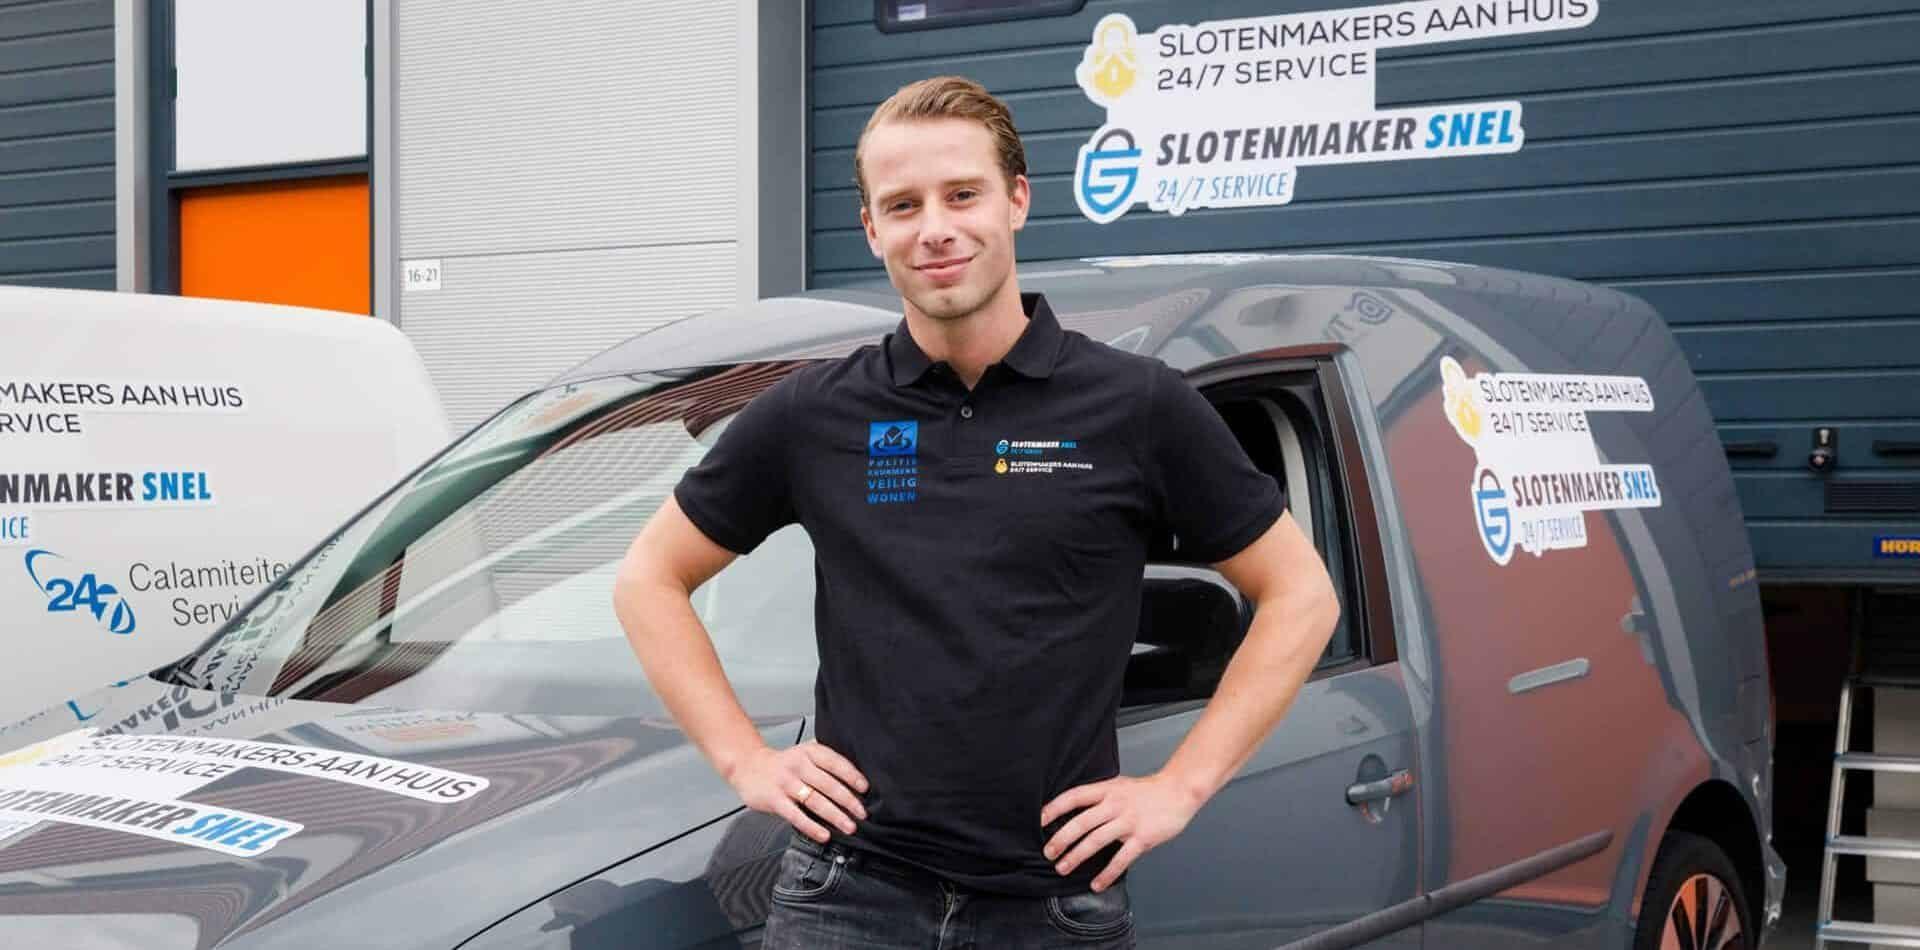 Slotenmaker Zutphen